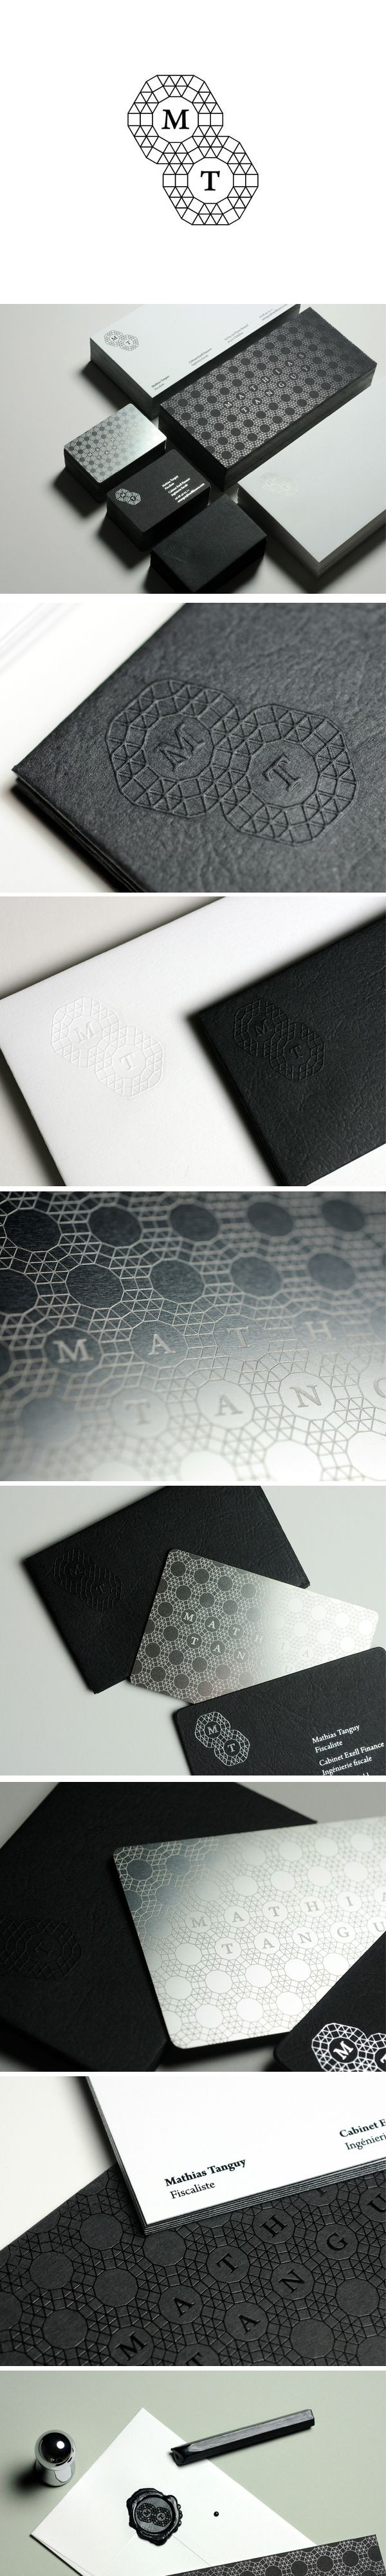 Visual identity   Stationery Design for Mathias Tanguy via Branding Served.